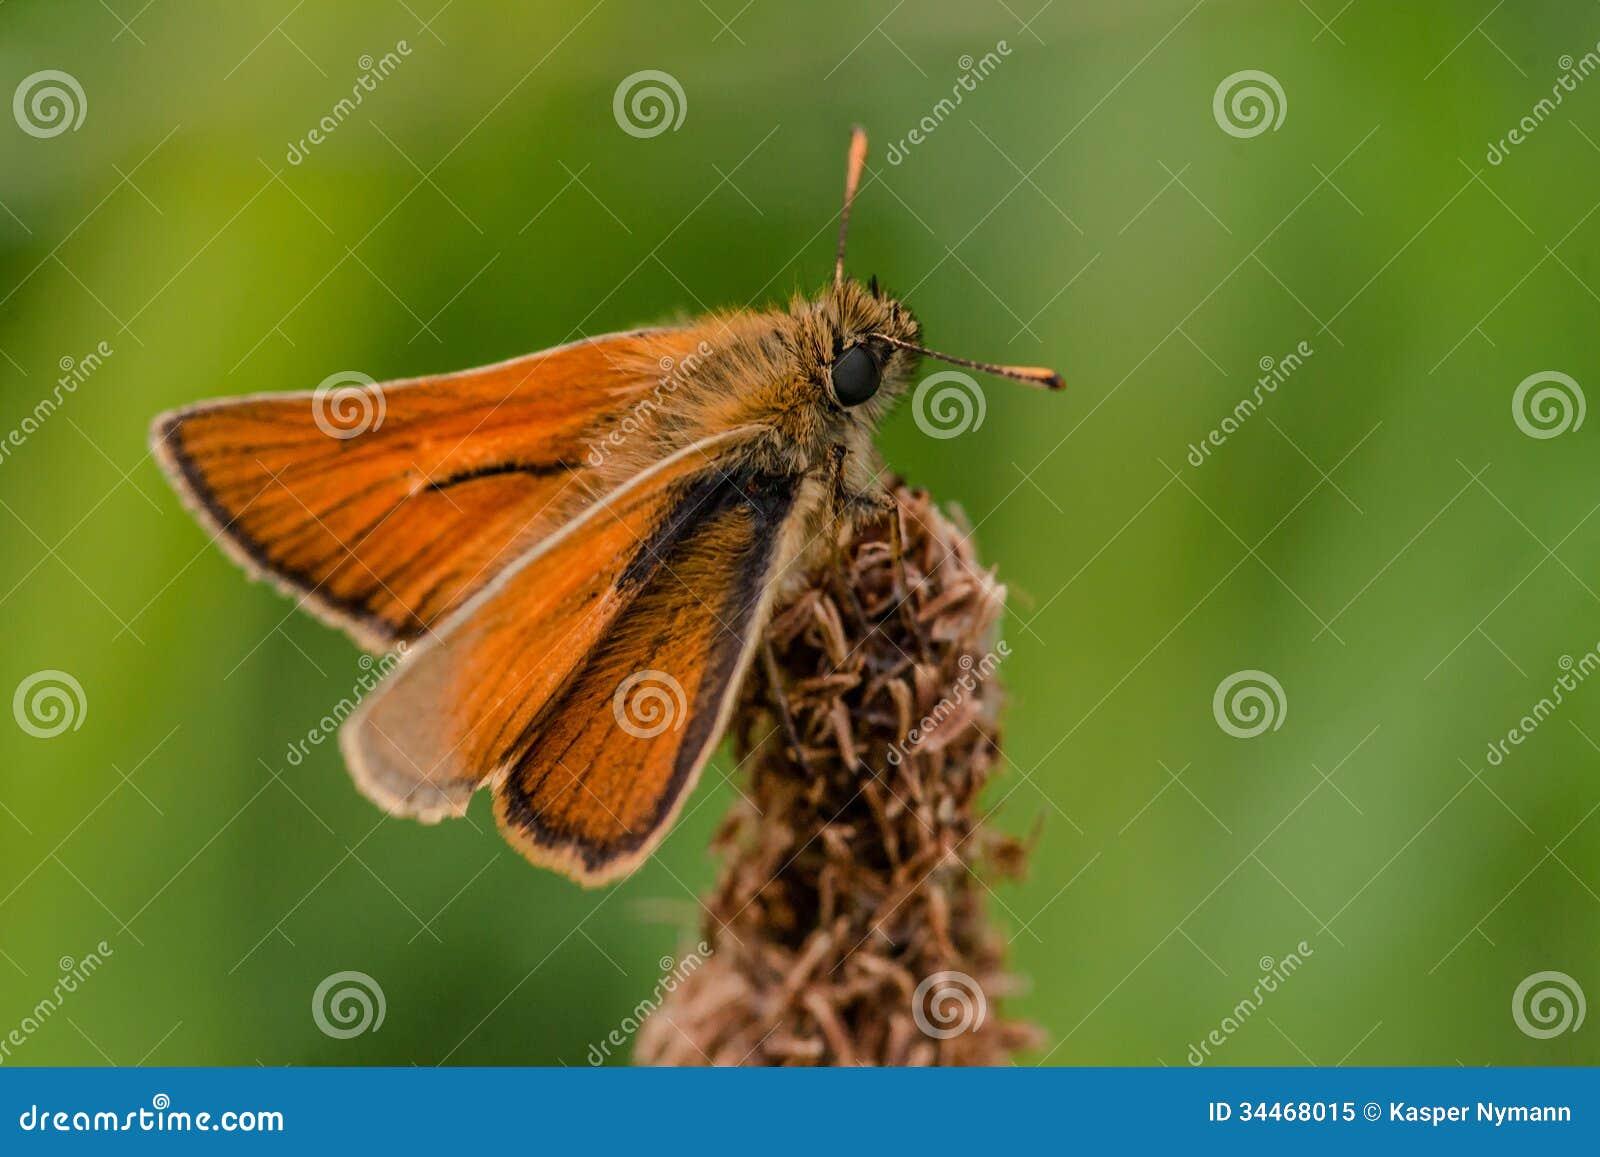 Venata moth